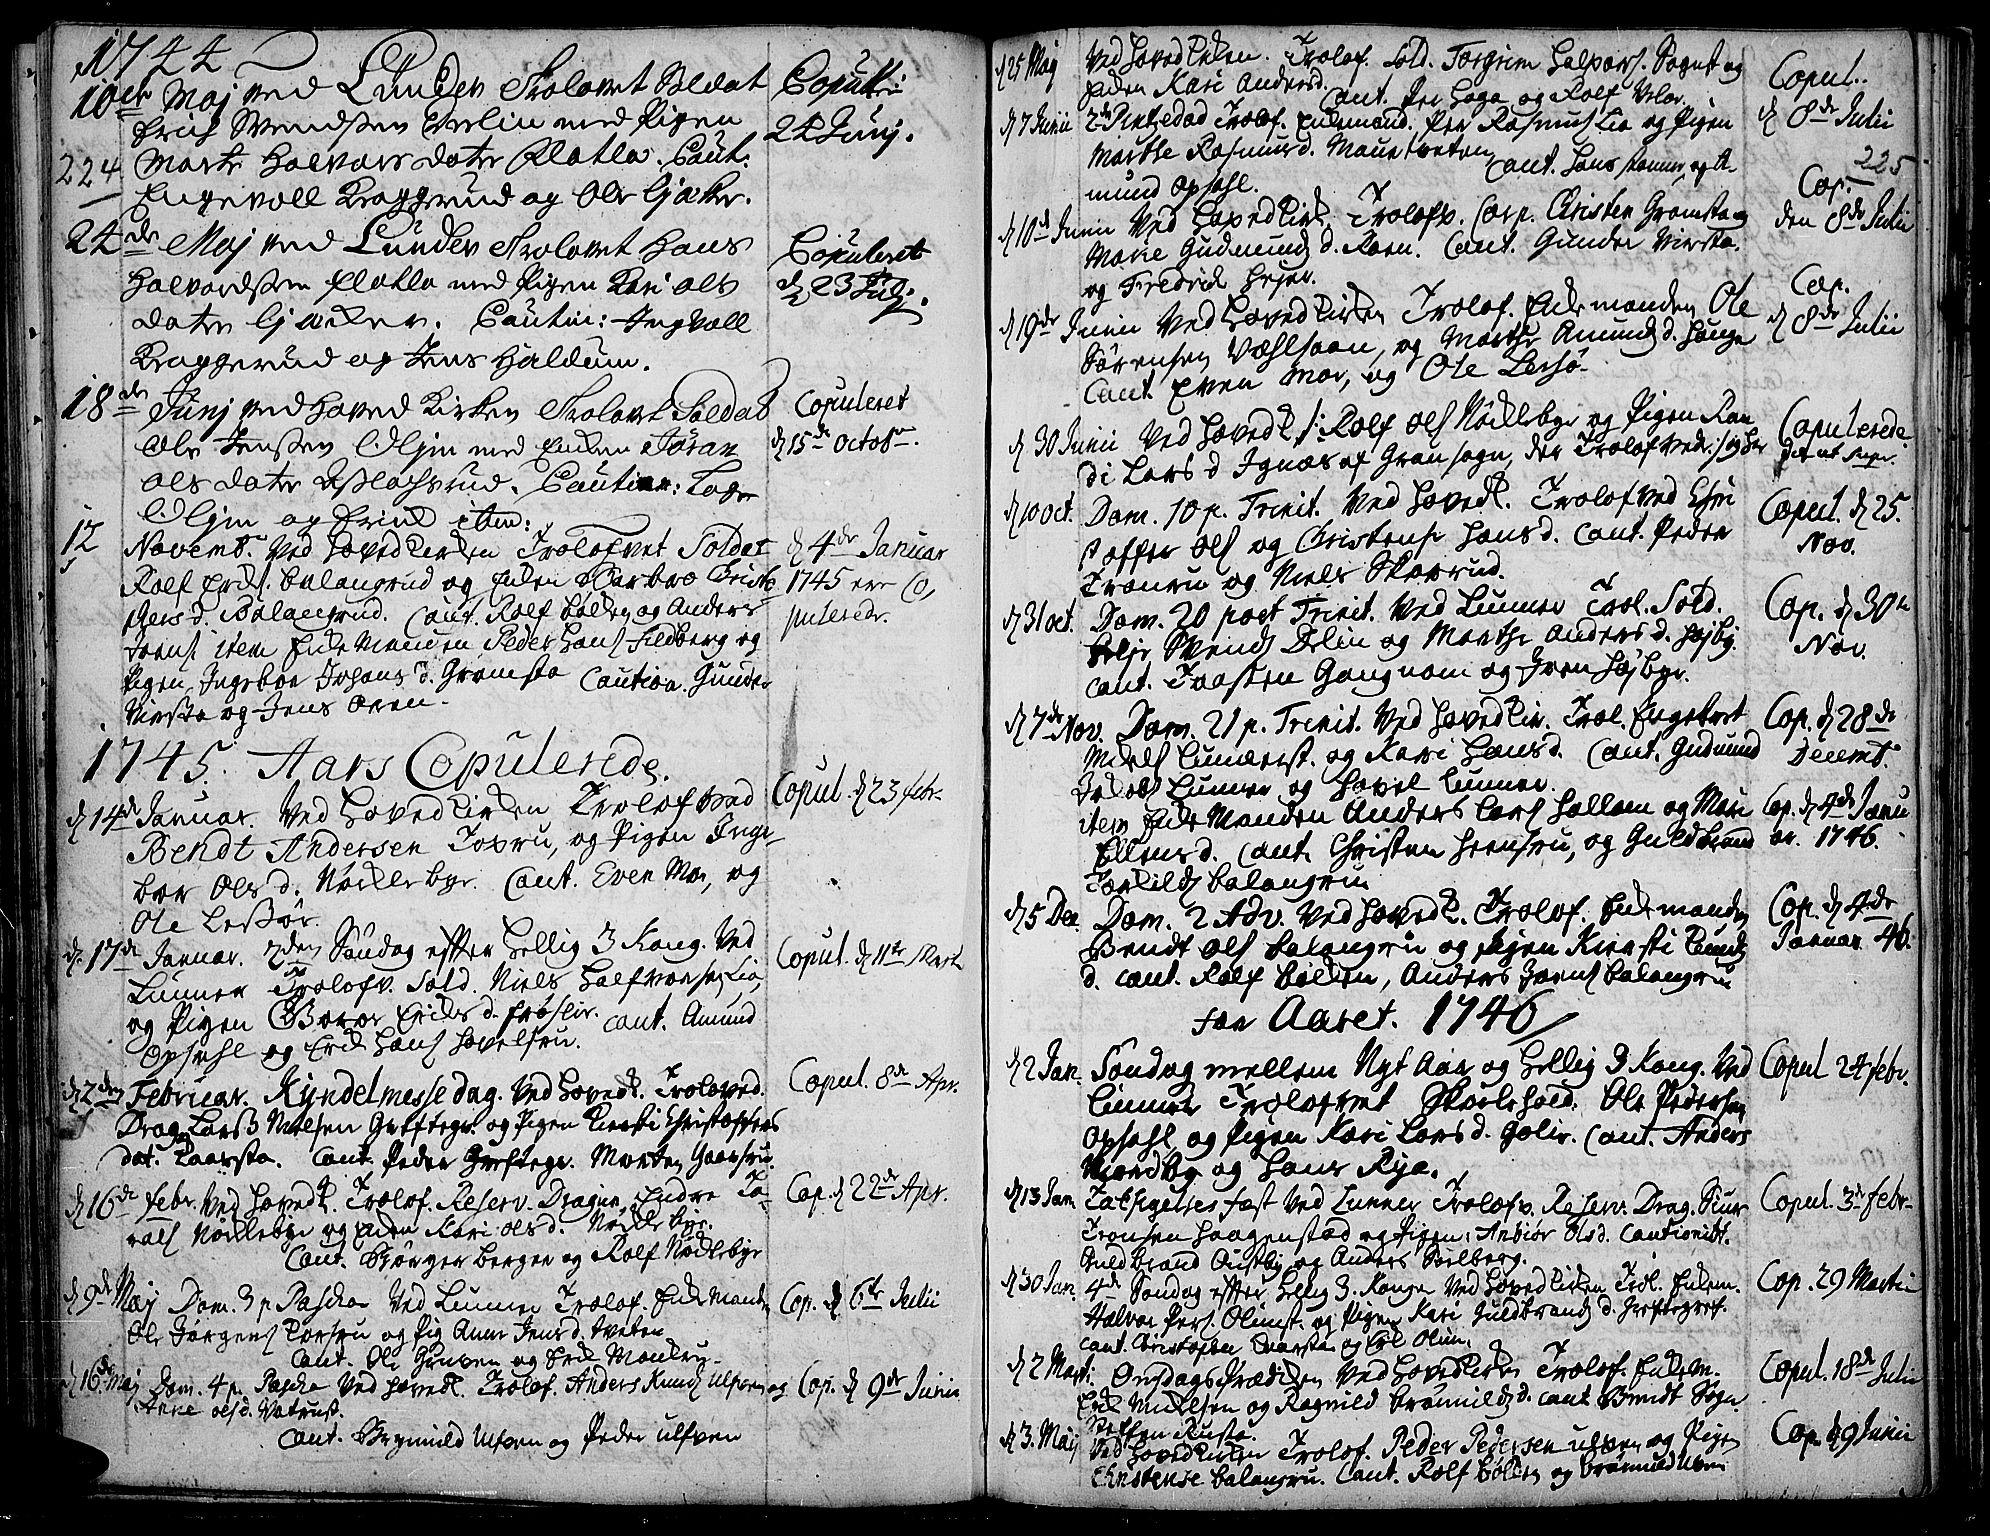 SAH, Jevnaker prestekontor, Ministerialbok nr. 2, 1725-1751, s. 224-225